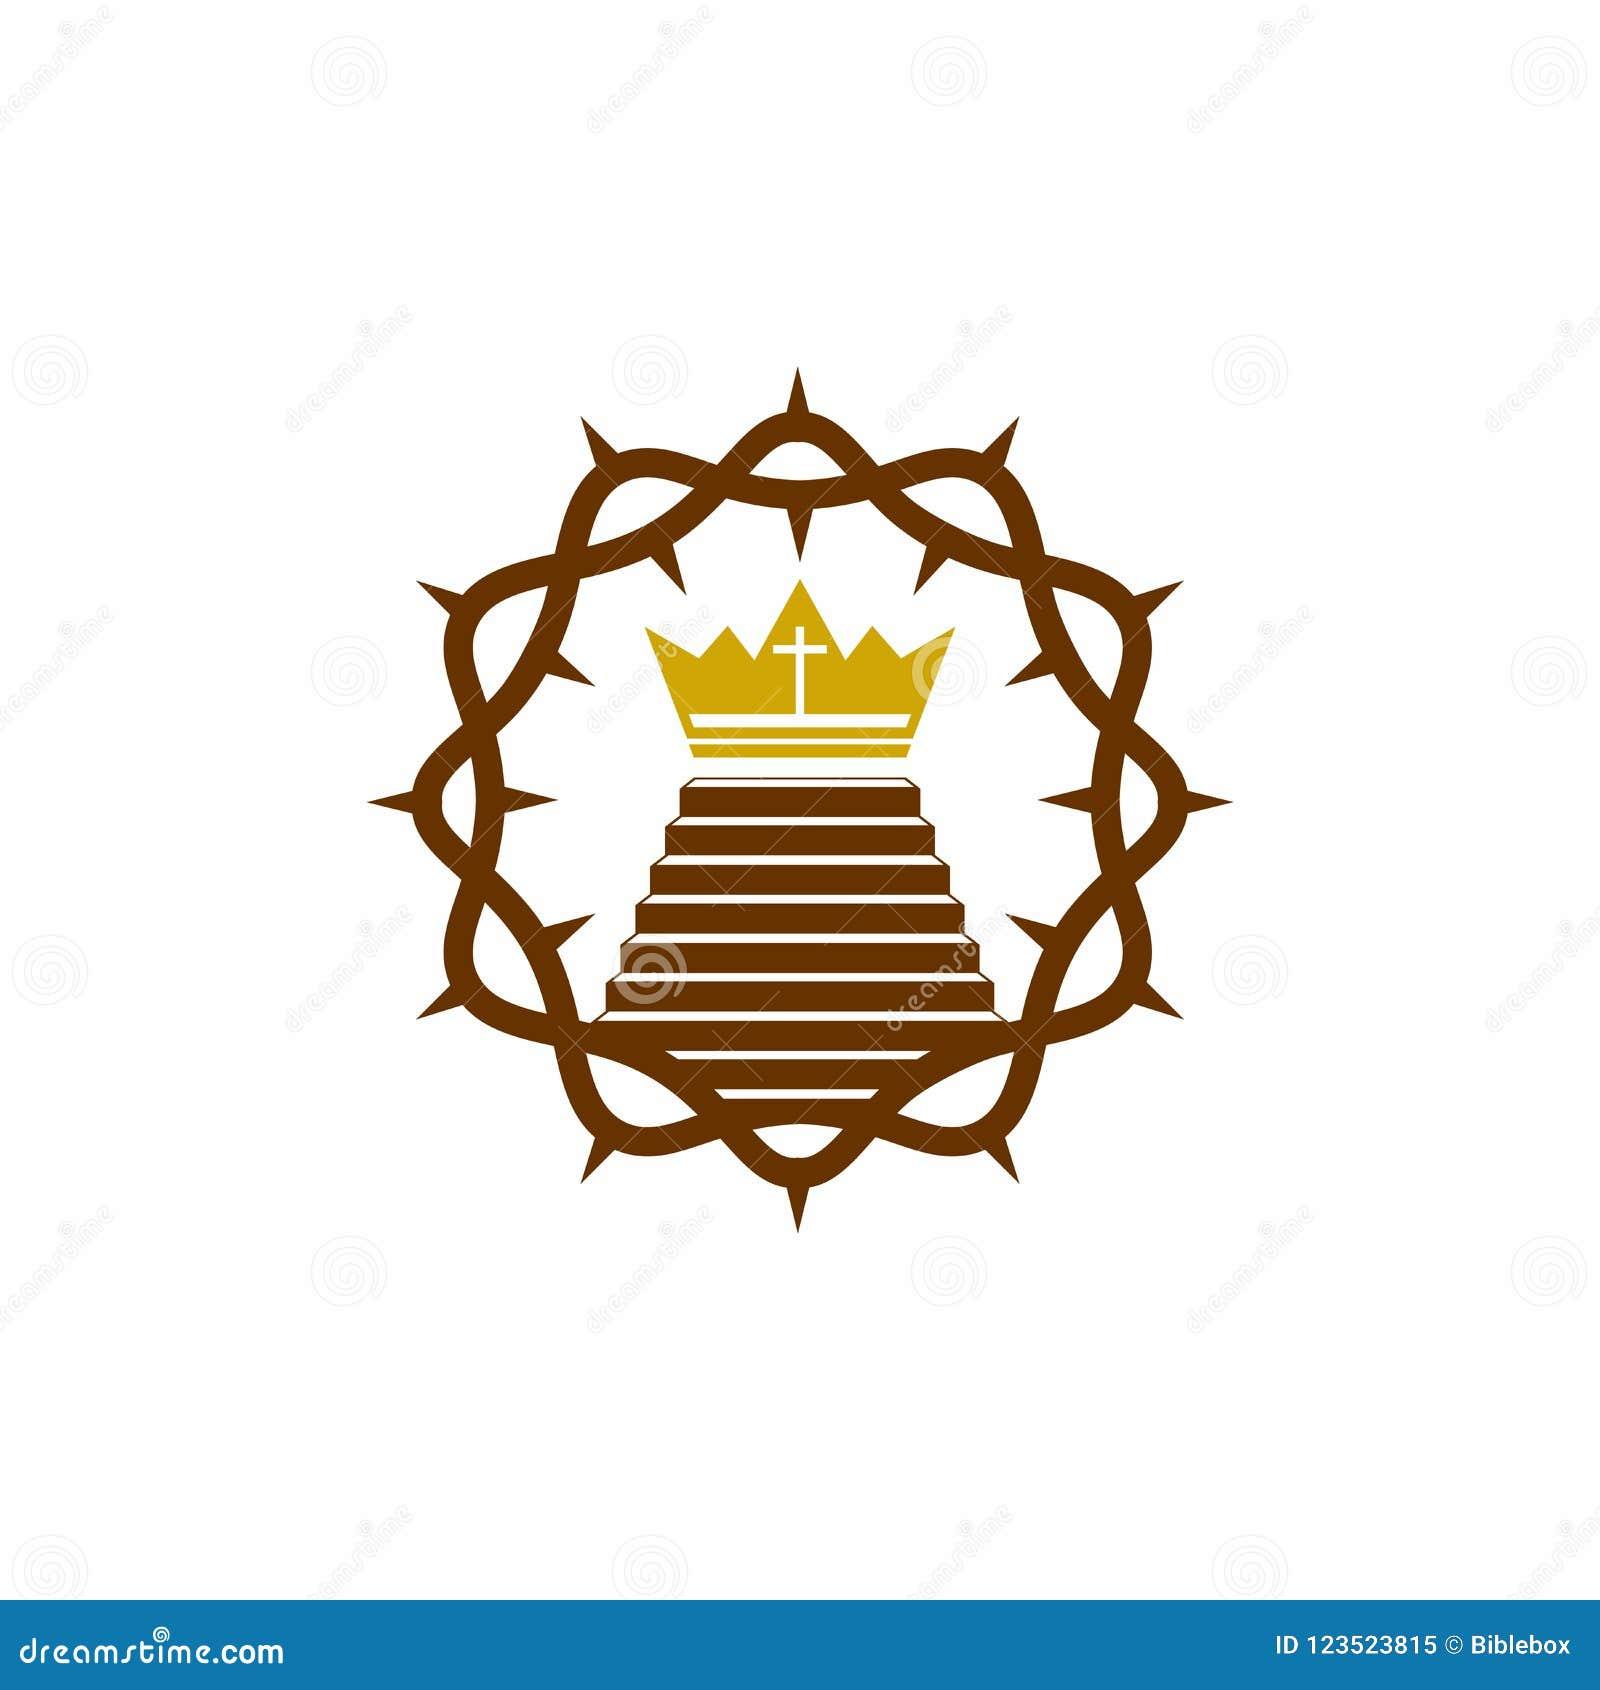 Church Logo Christian Symbols The Crown Of Thorns Jesus Christ The